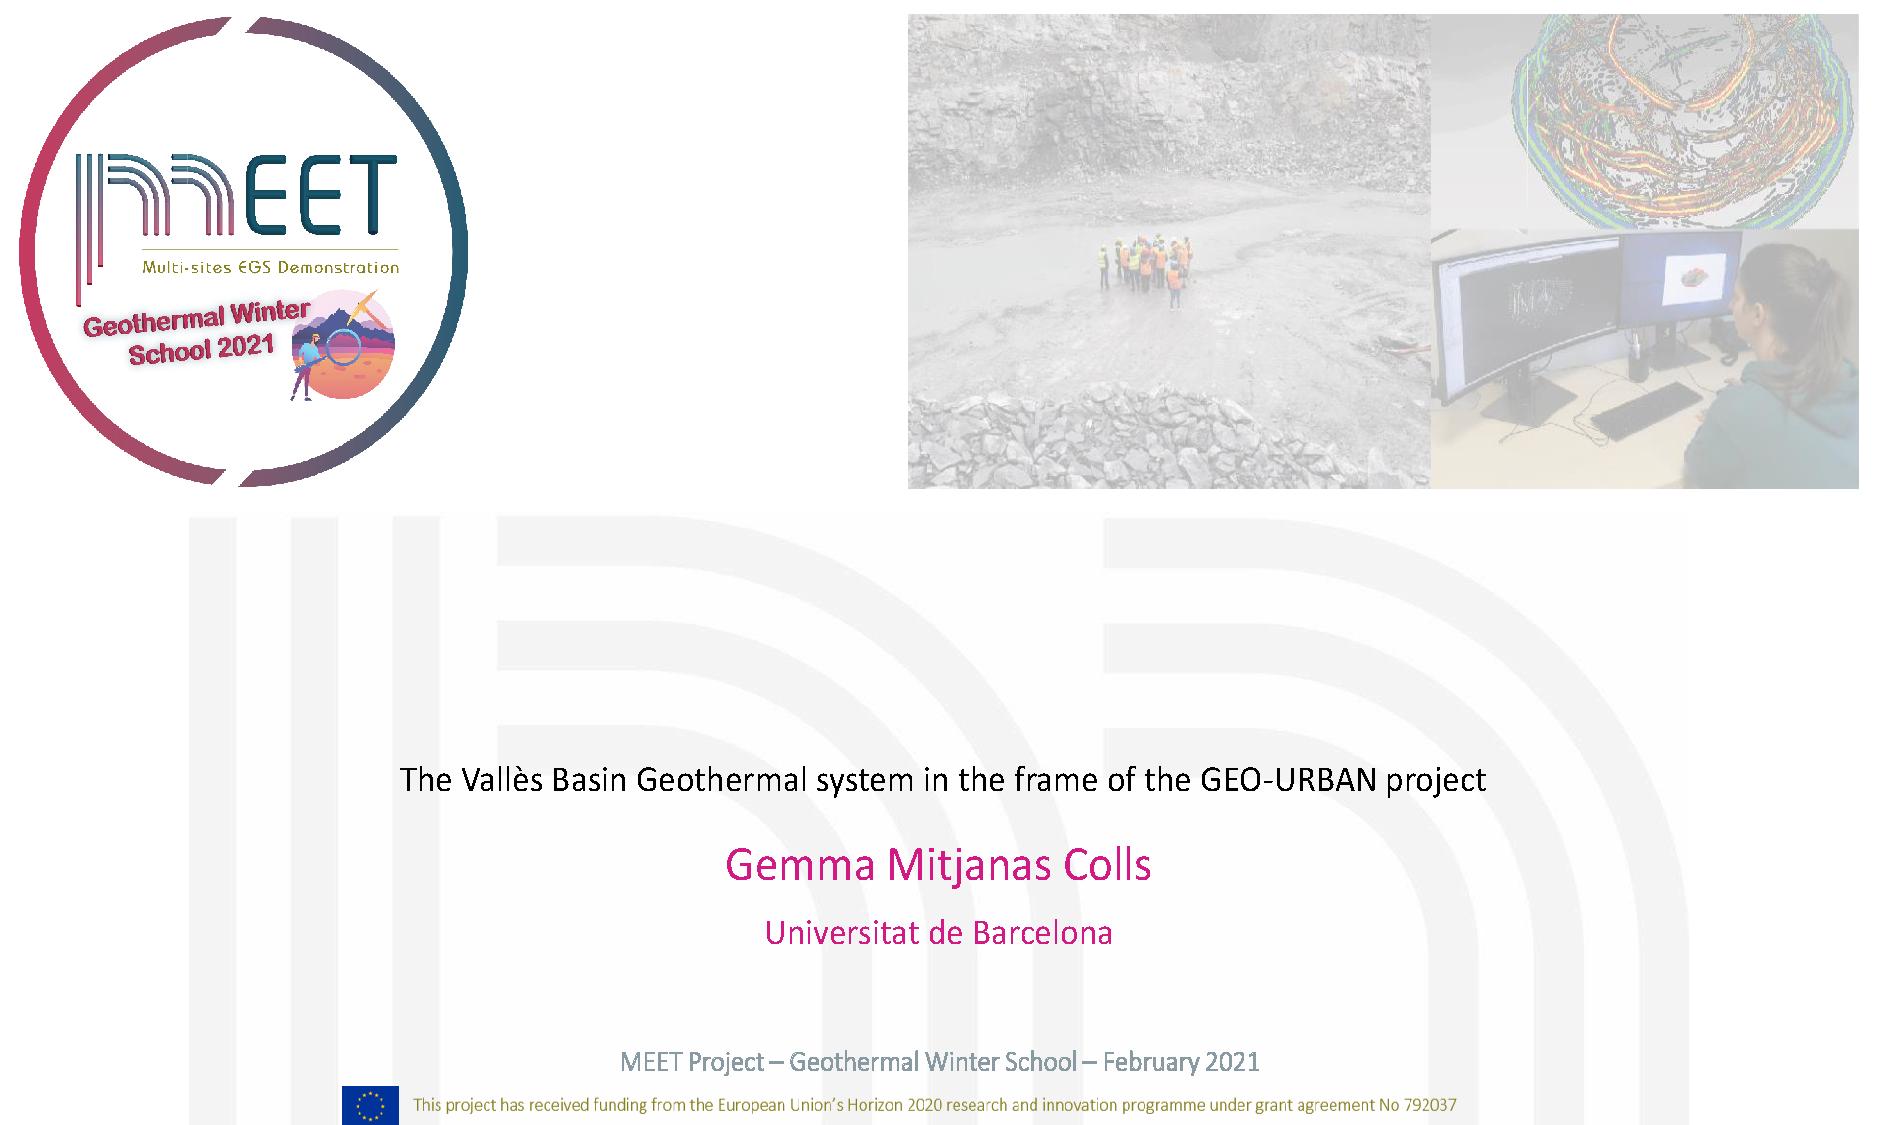 MEET Geothermal Winter School Gemma Mitjanas Colls first slide visual